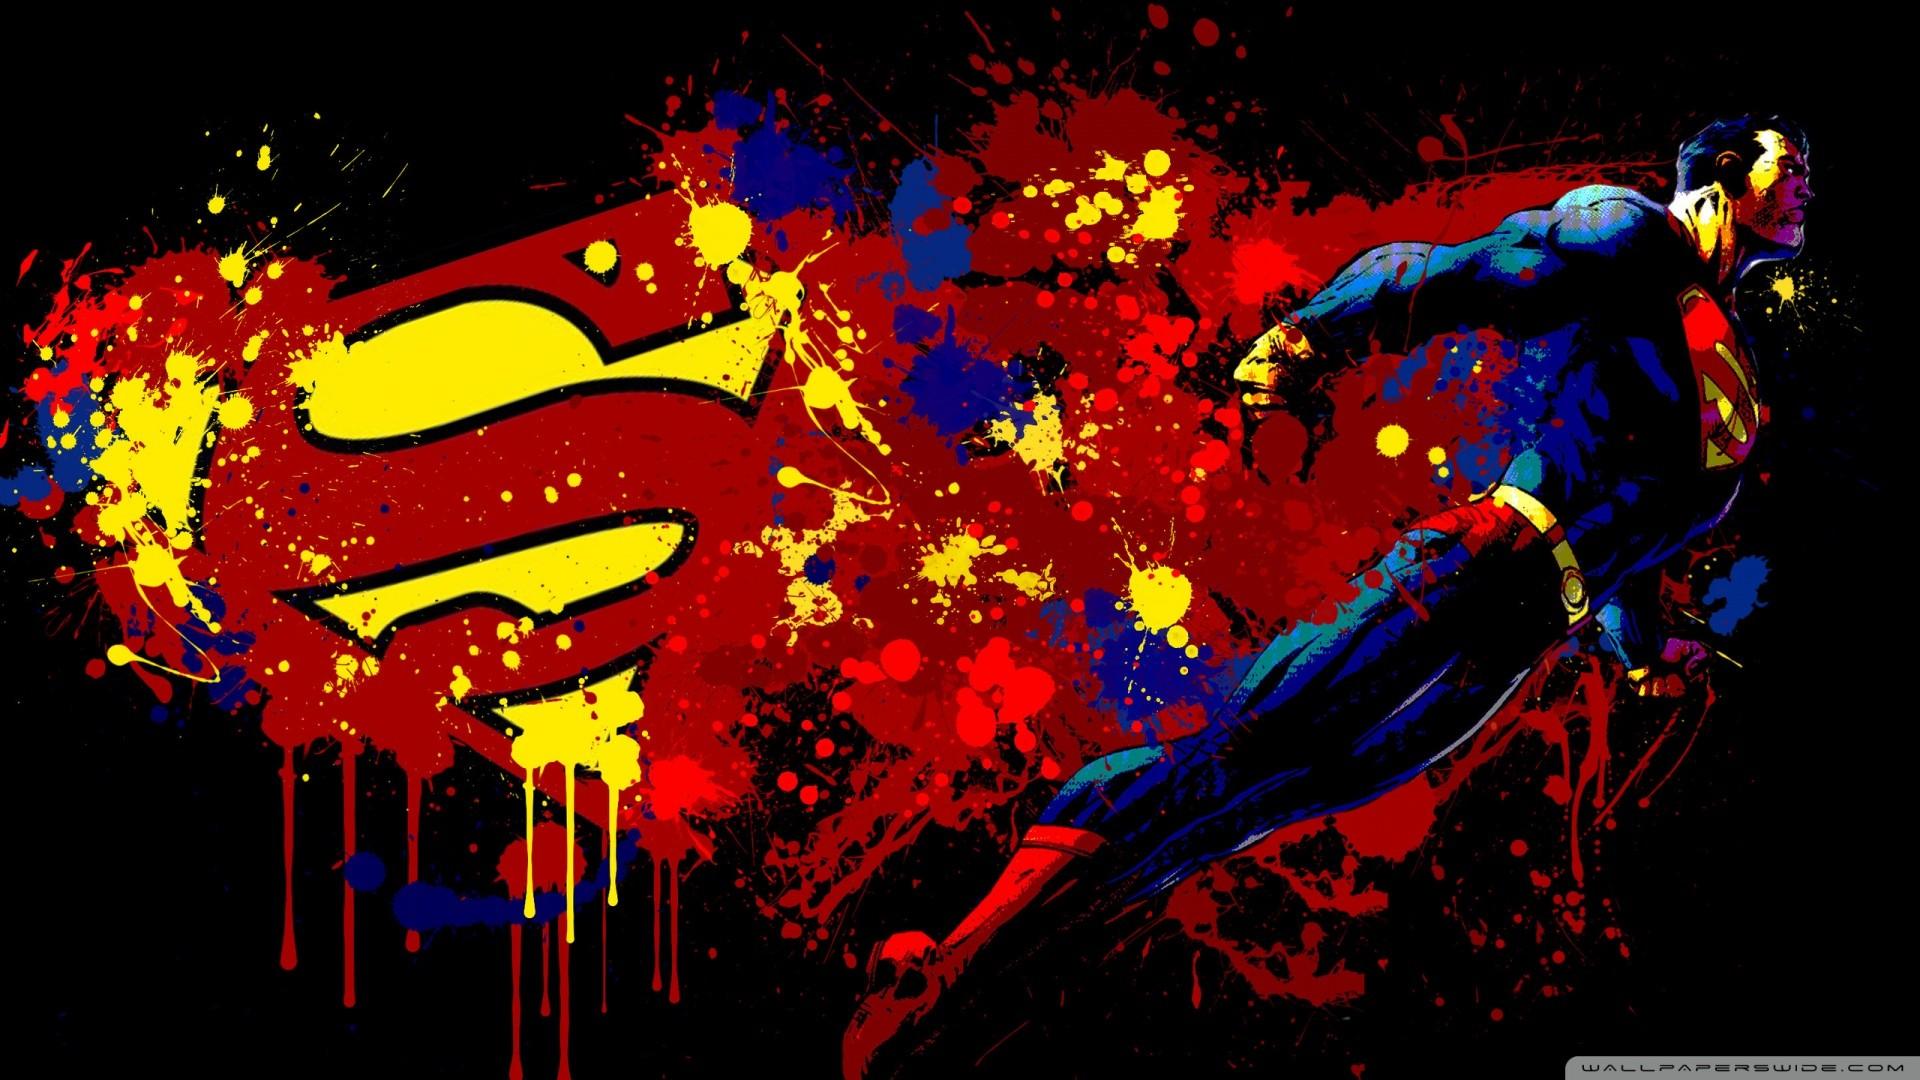 HD Superman Abstract Cartoon 1080p Wallpaper Full Size .